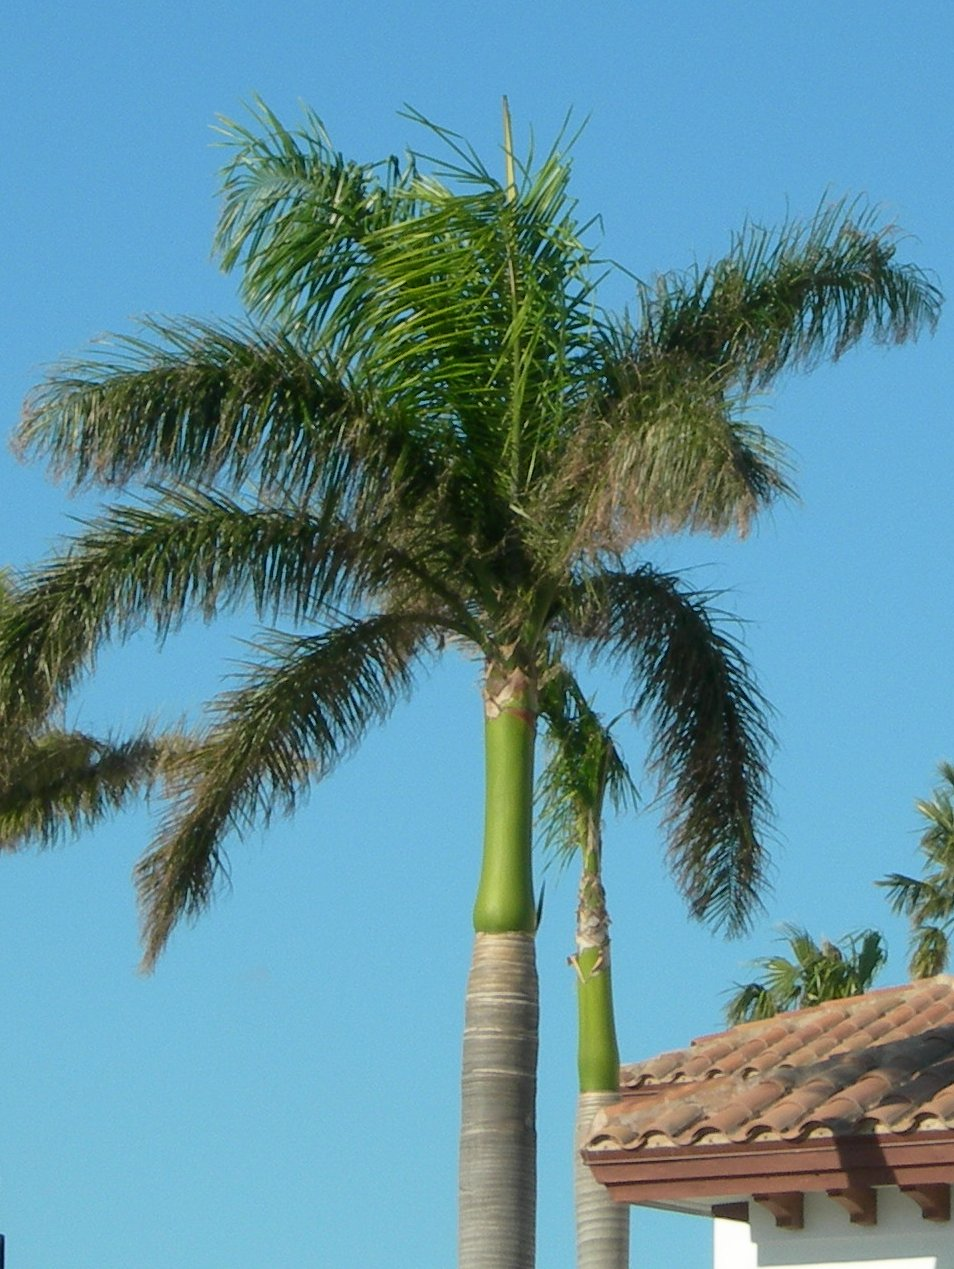 File:Royal palm tree in Boca Raton.jpg - Wikipedia